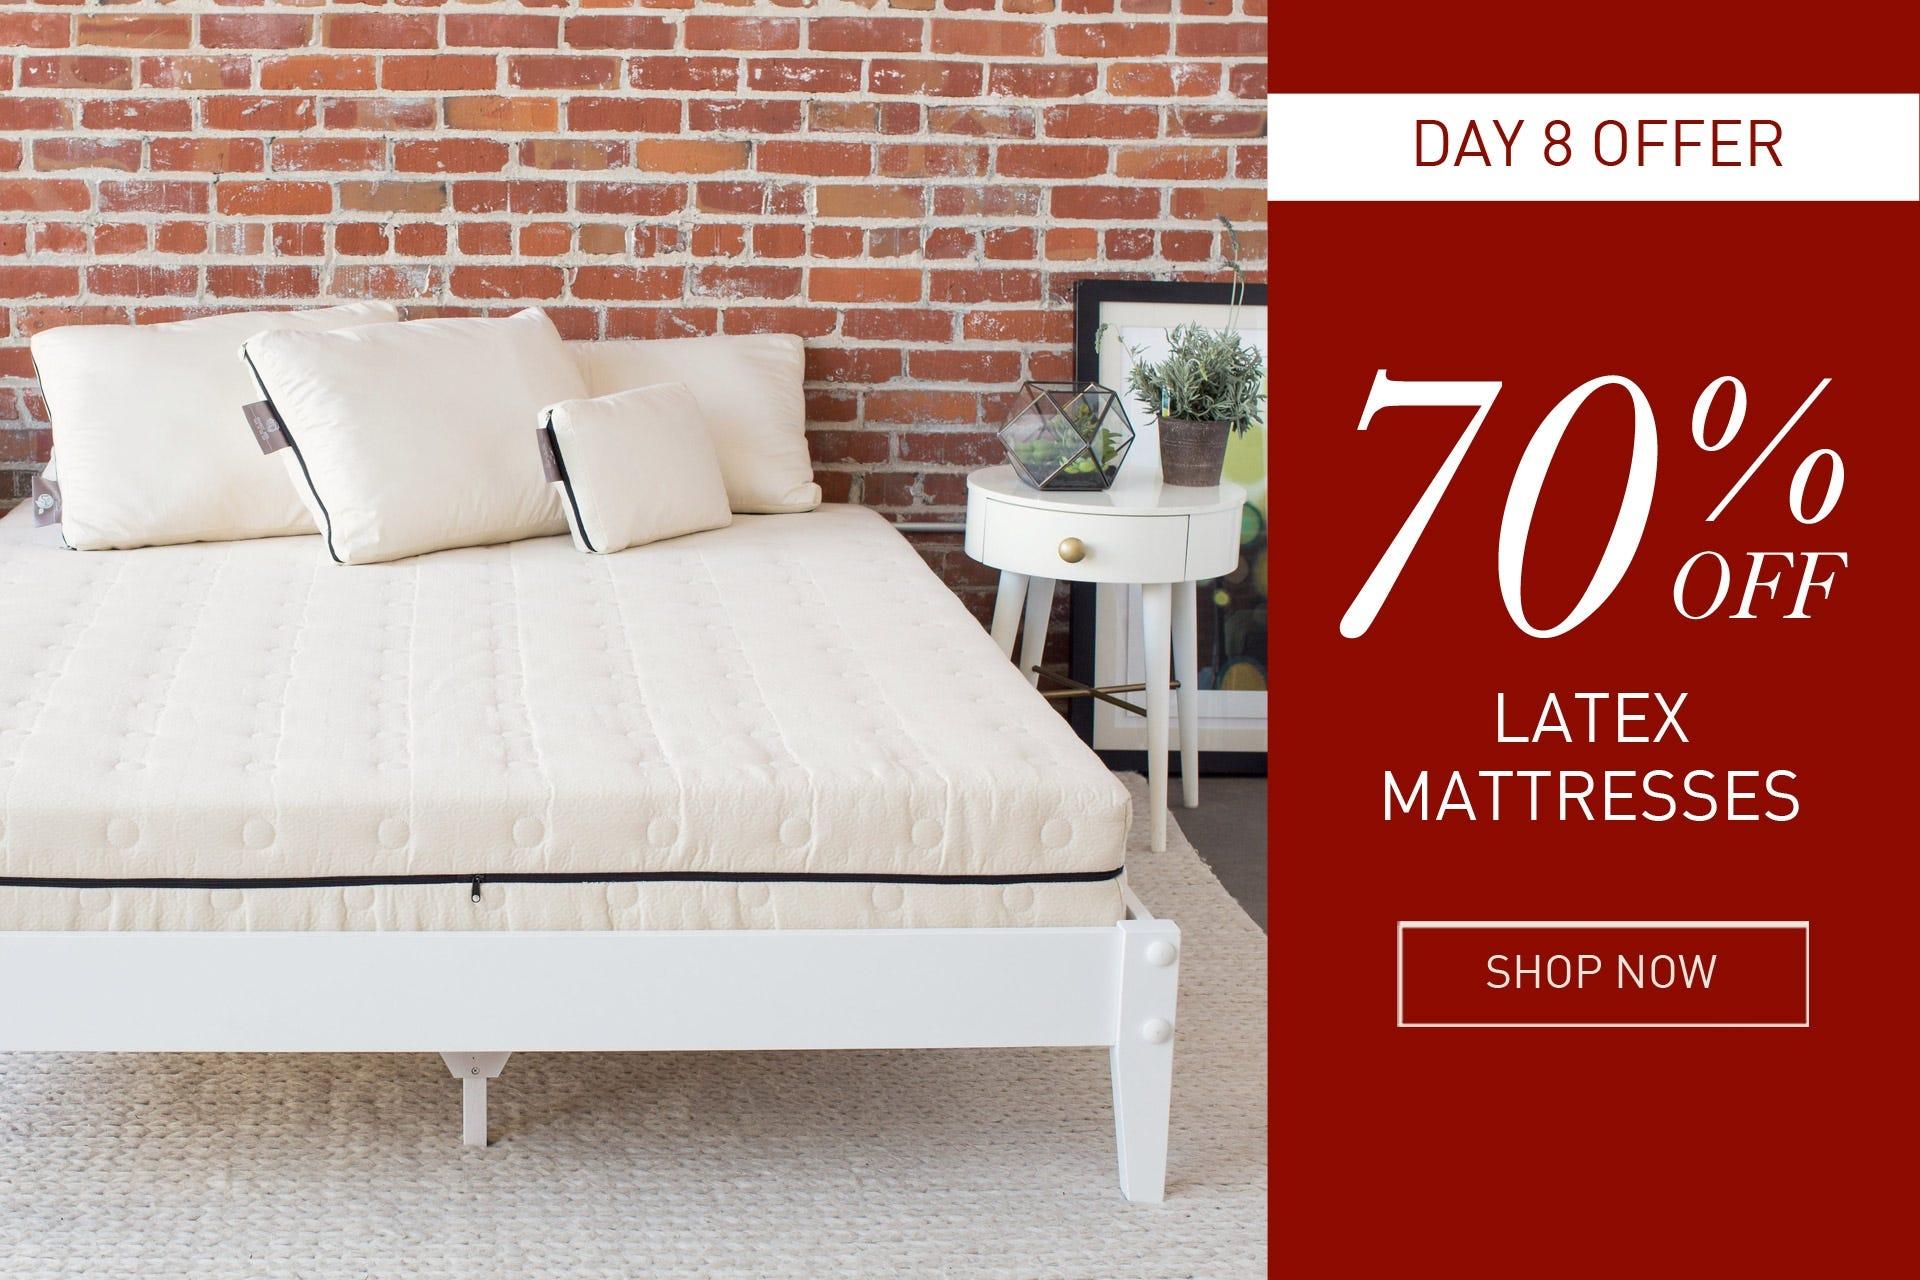 latex mattresses